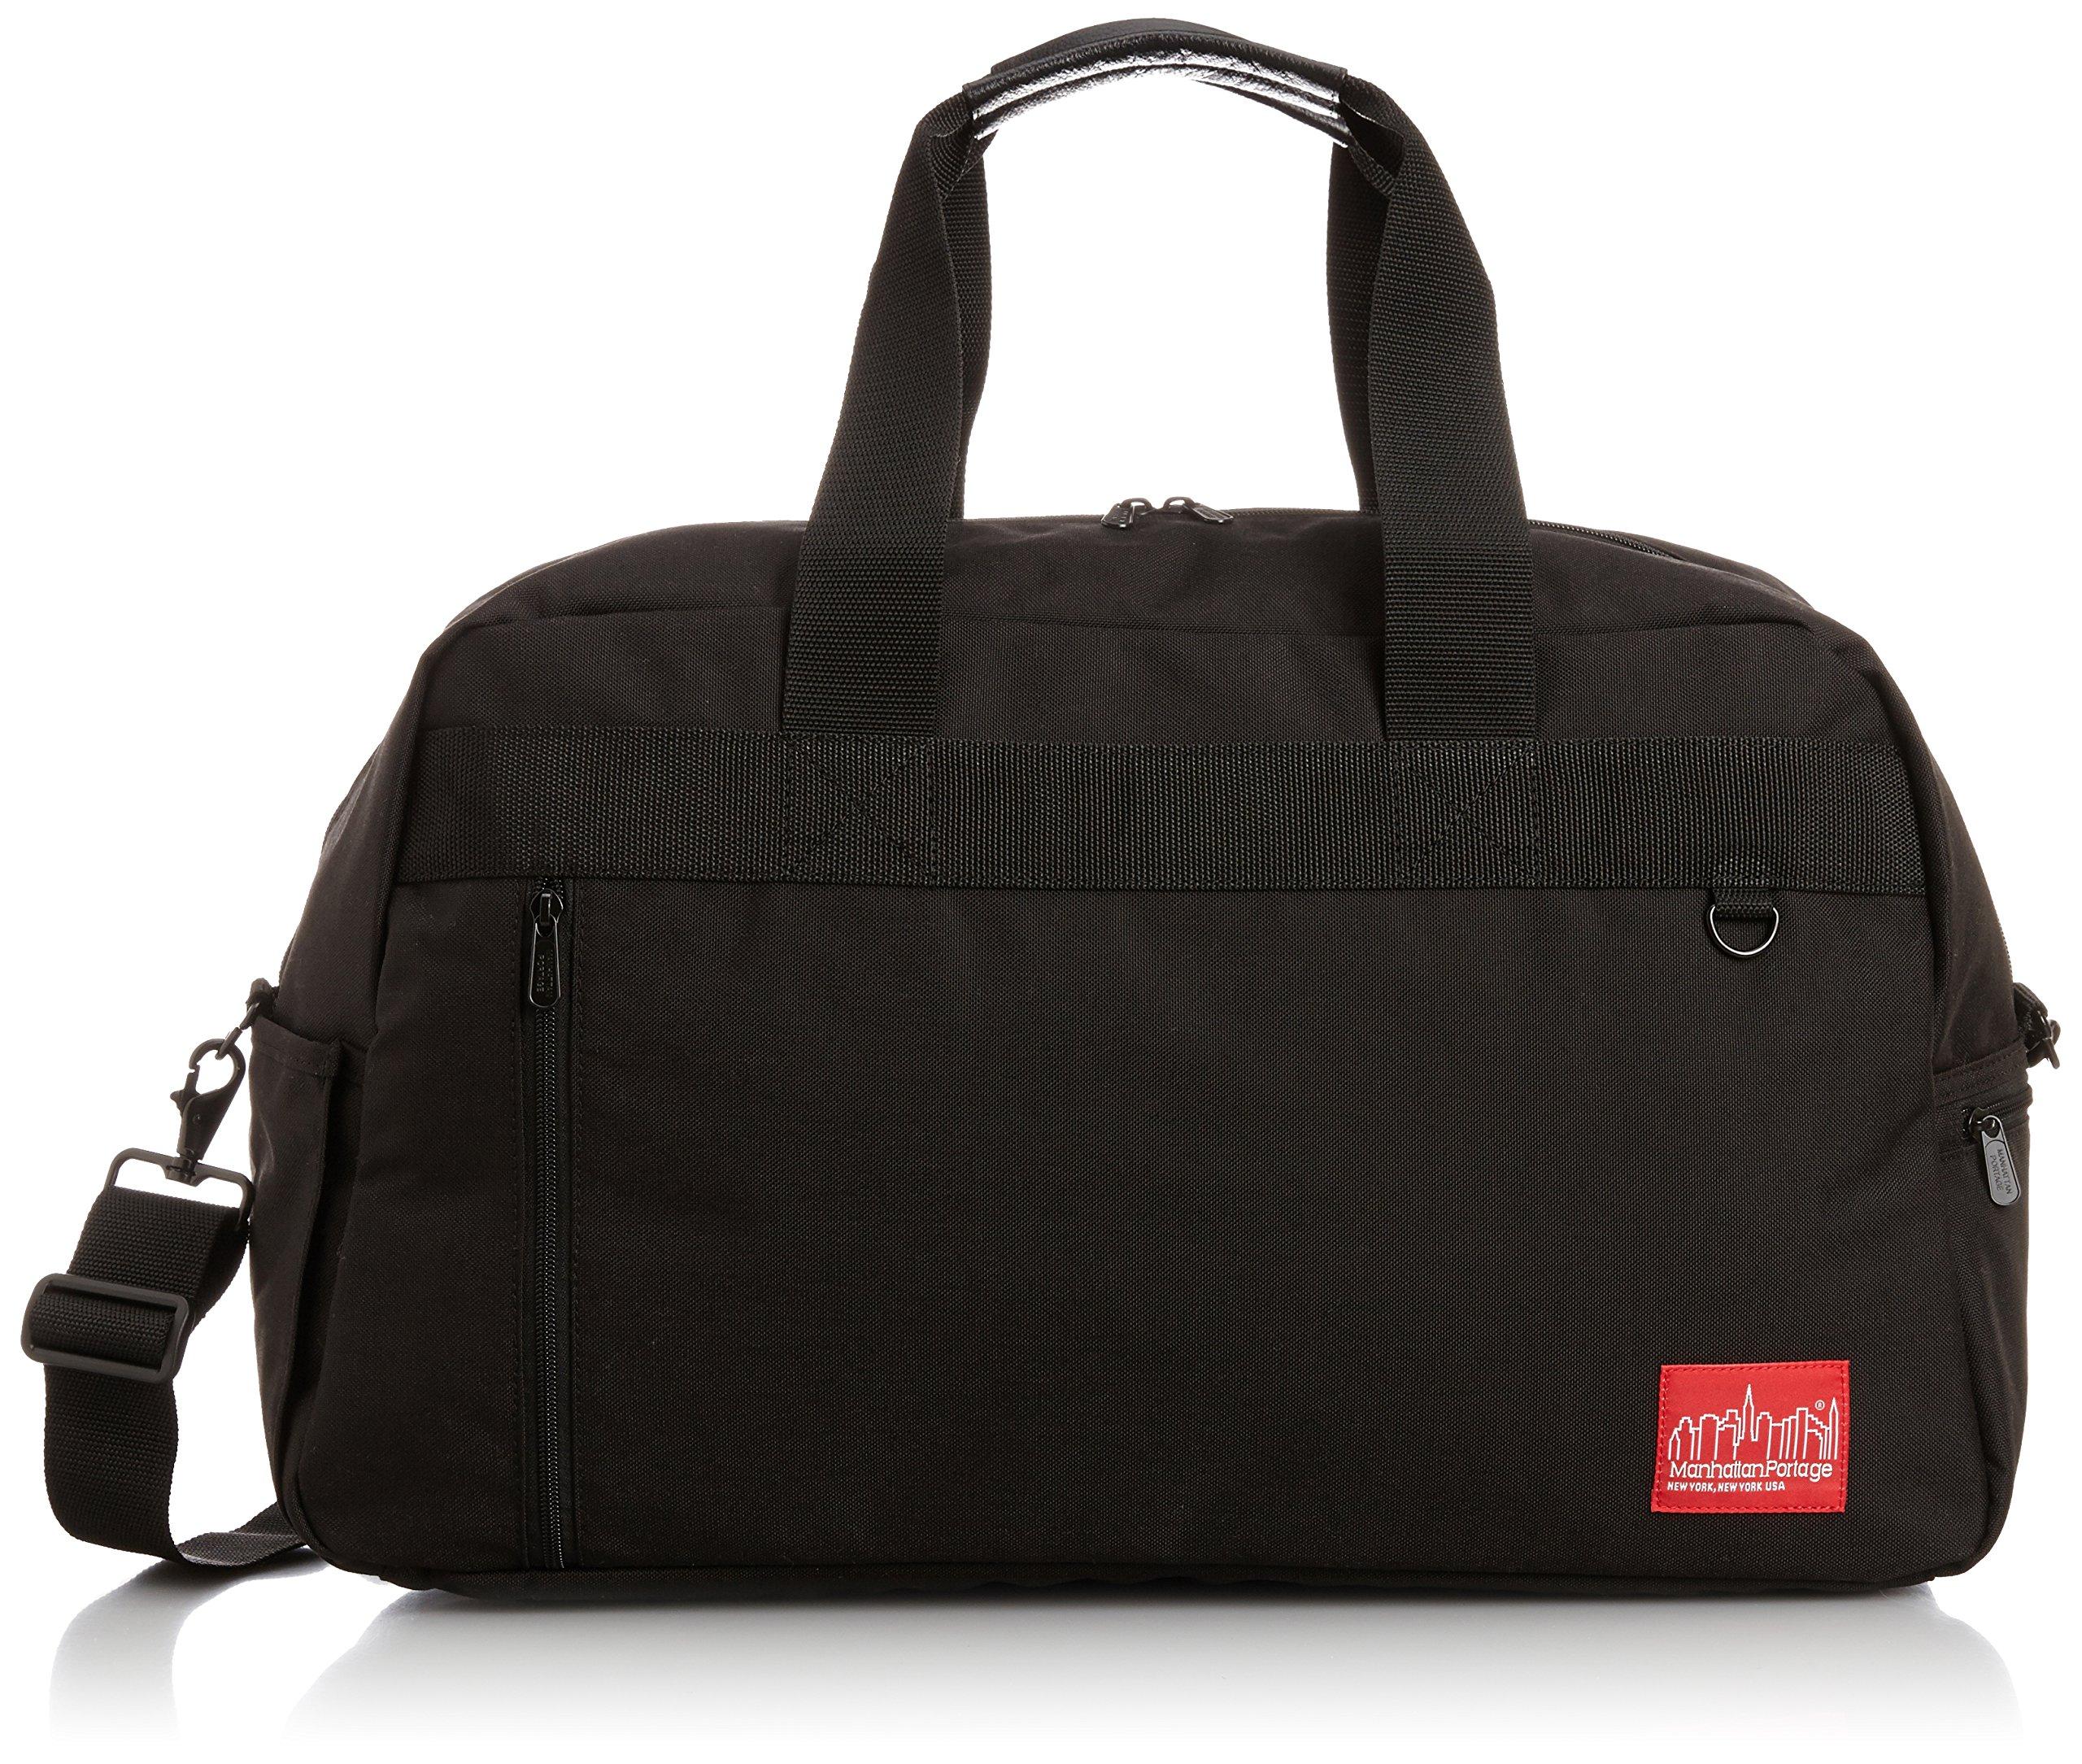 Manhattan Portage Duffel Bag Featuring CORDURA Brand Fabric, Black